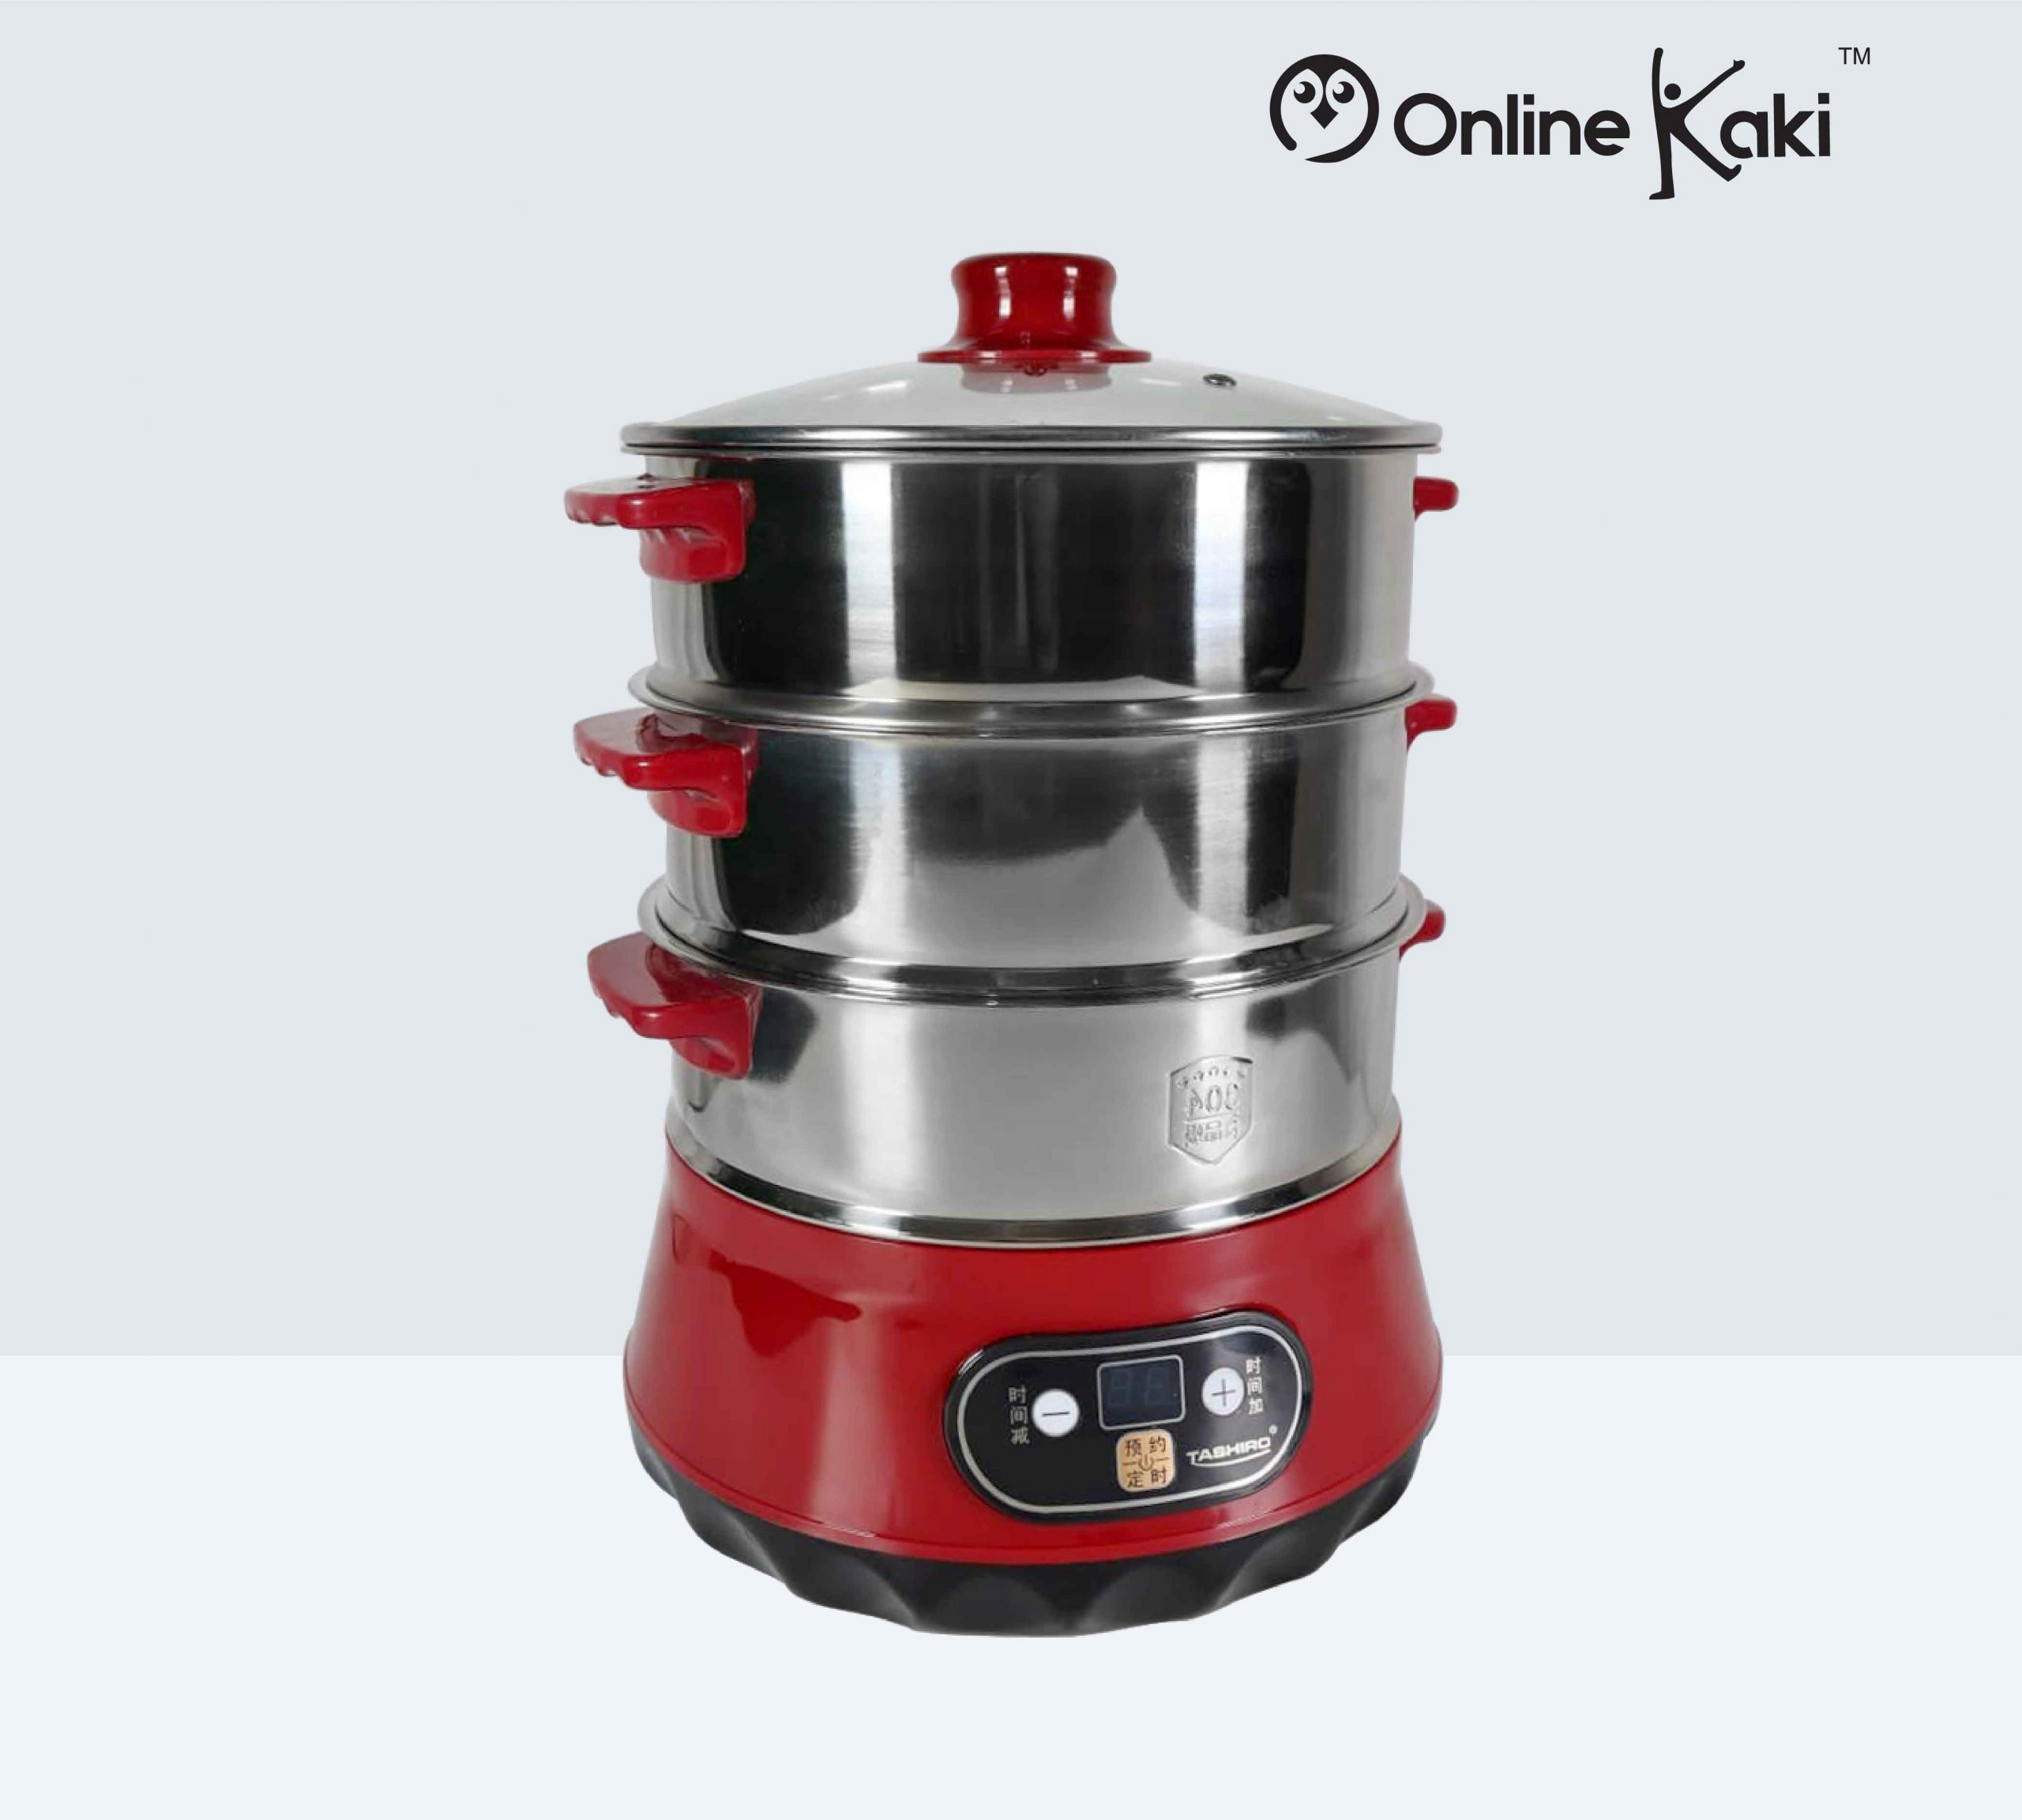 TASHIRO TH-1481 Multifunctional Electric Food Steamer 快速电蒸锅